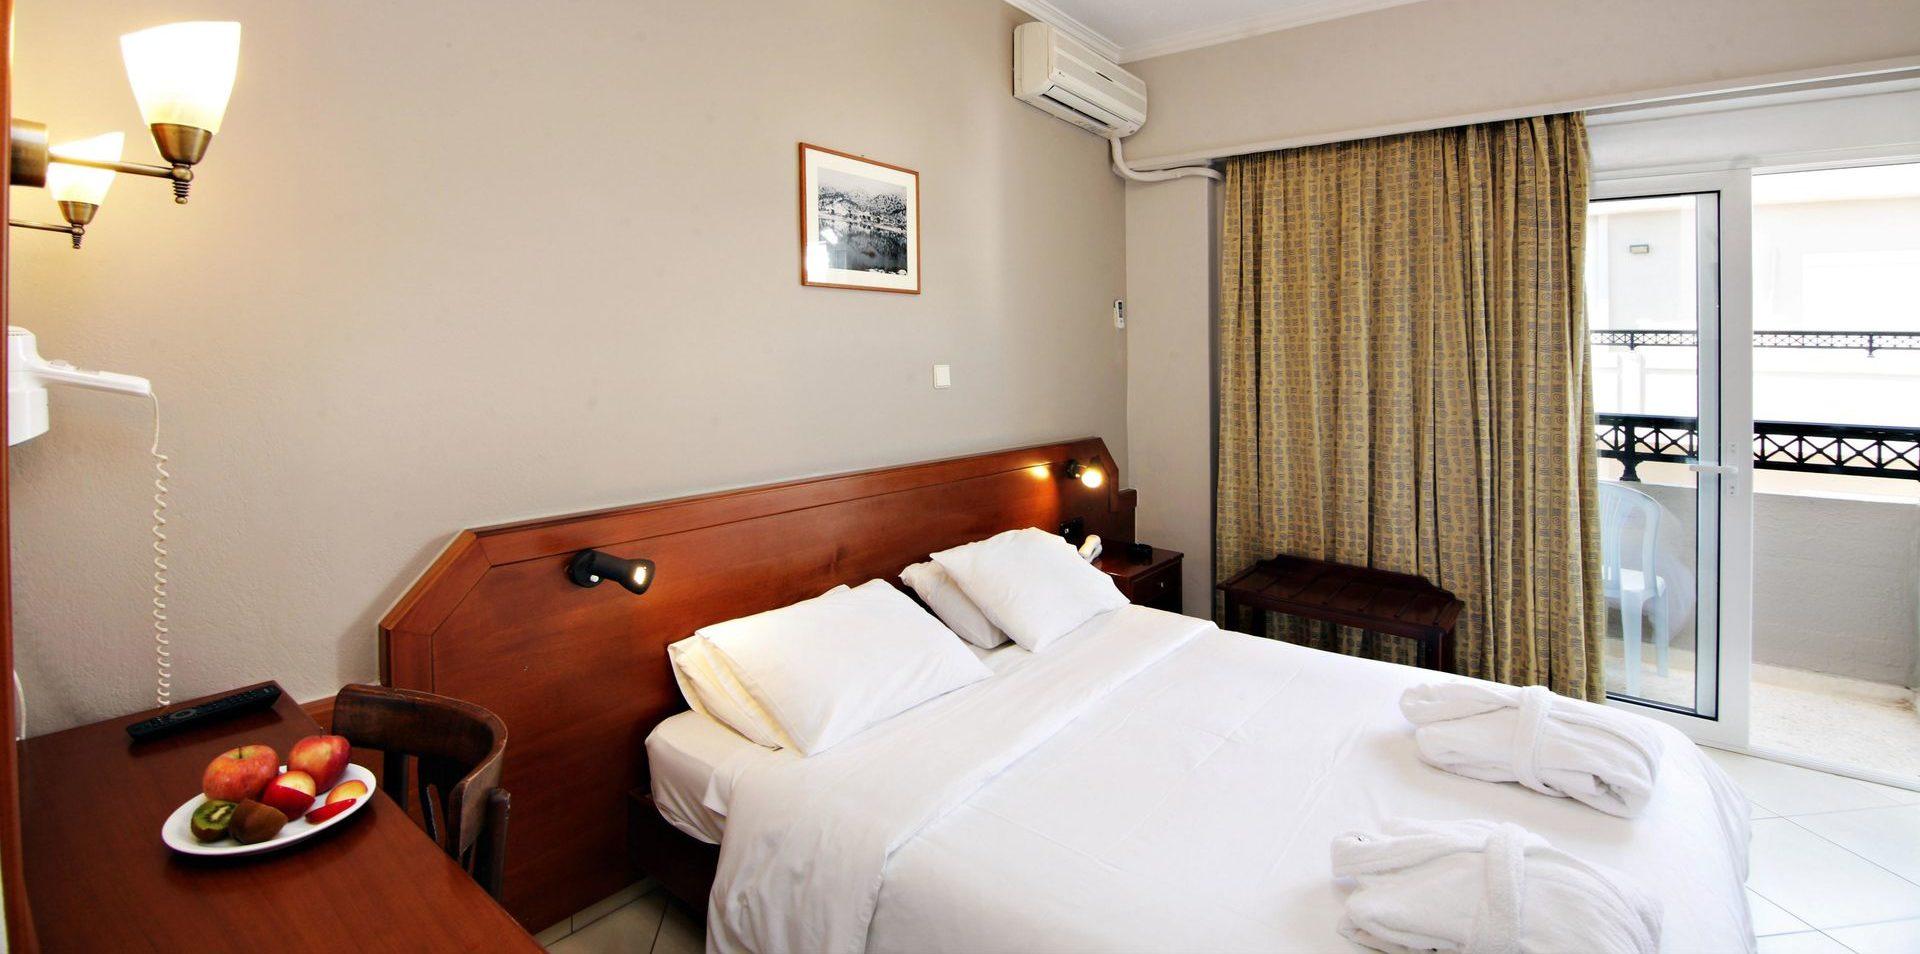 Economy Double Room 1 Arkadi Hotel Chania city center Crete